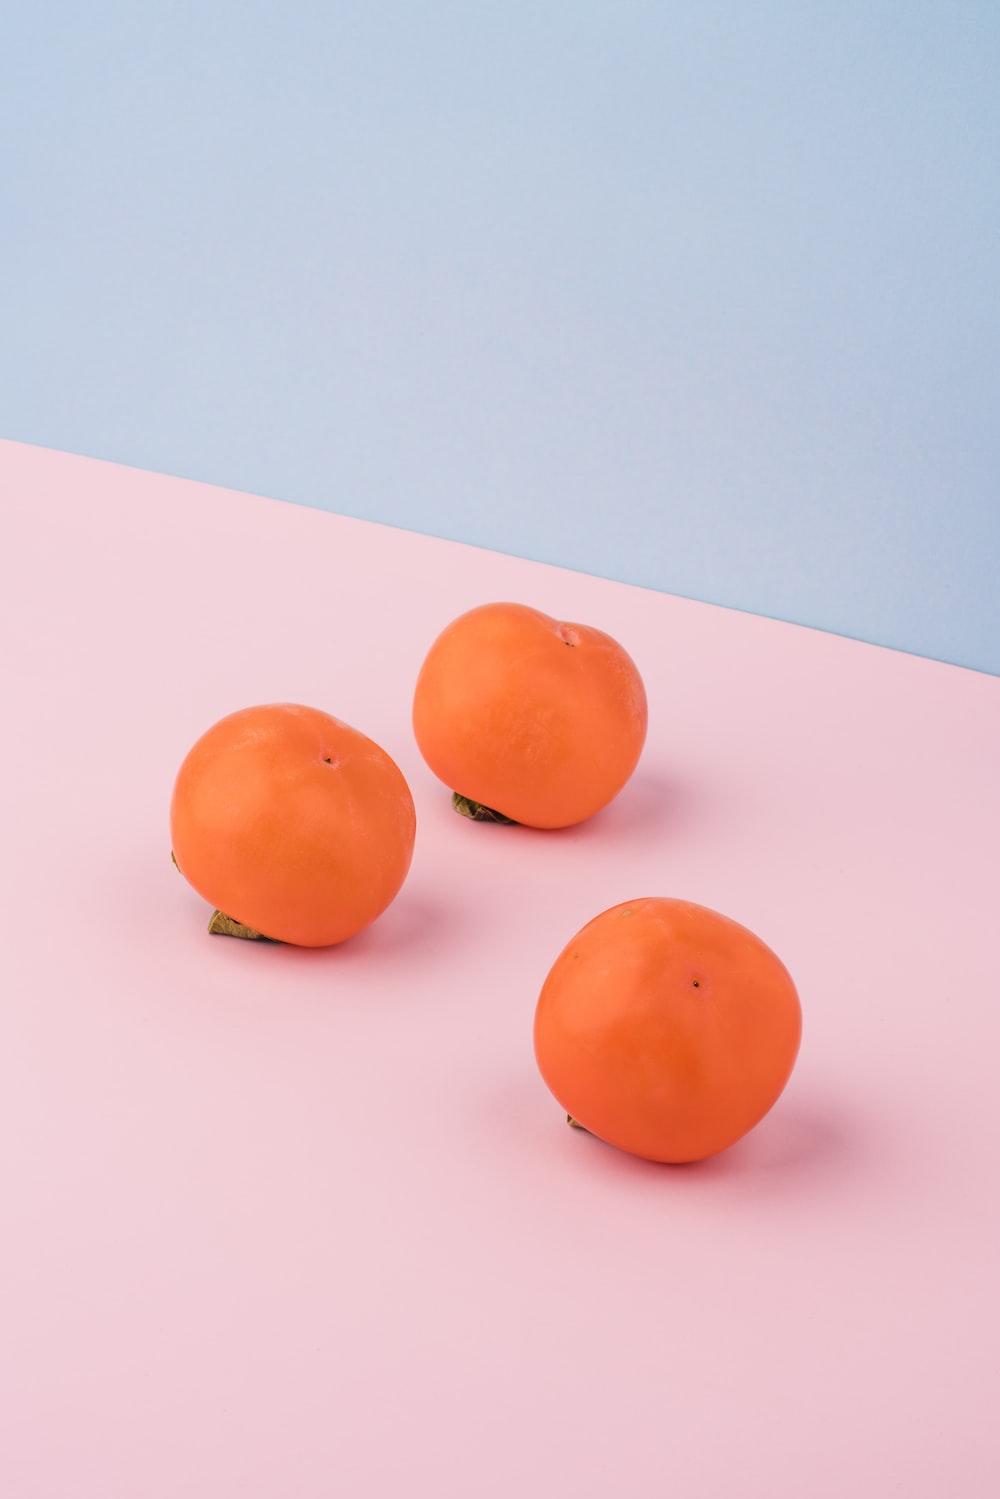 three orange fruits on pink surface